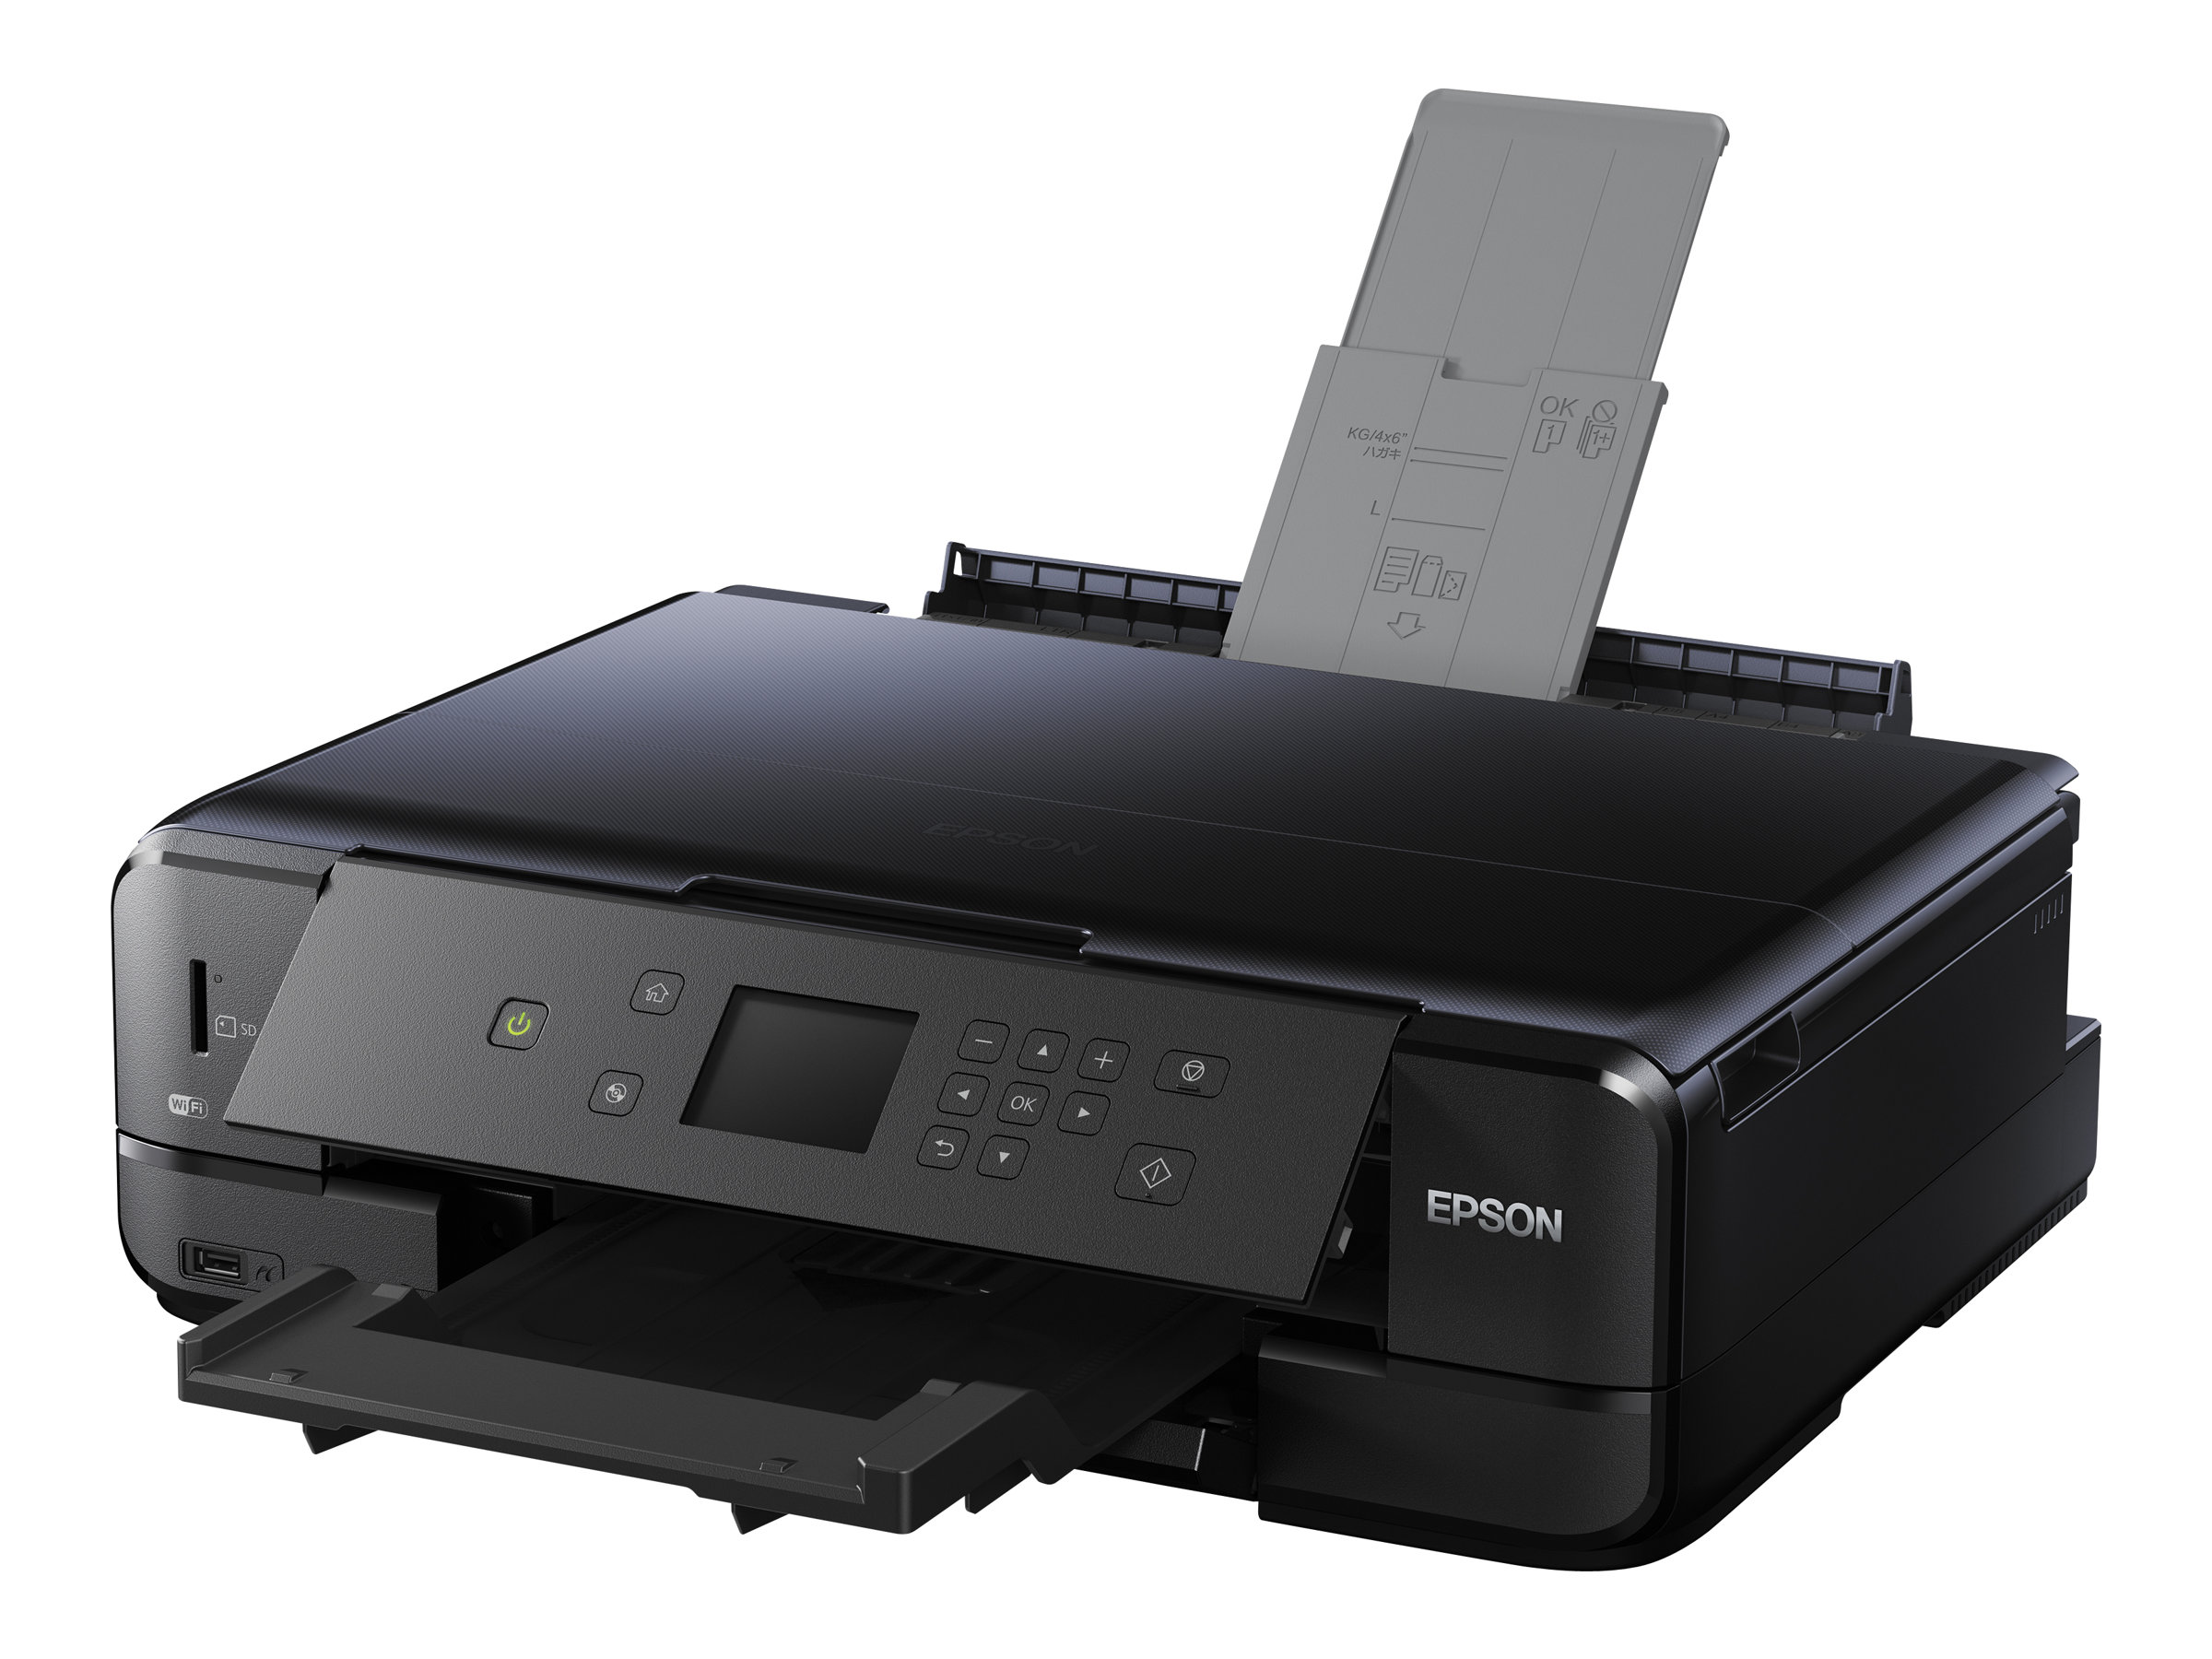 Epson Expression Premium XP-900 - Multifunktionsdrucker - Farbe - Tintenstrahl - A3 (Medien)